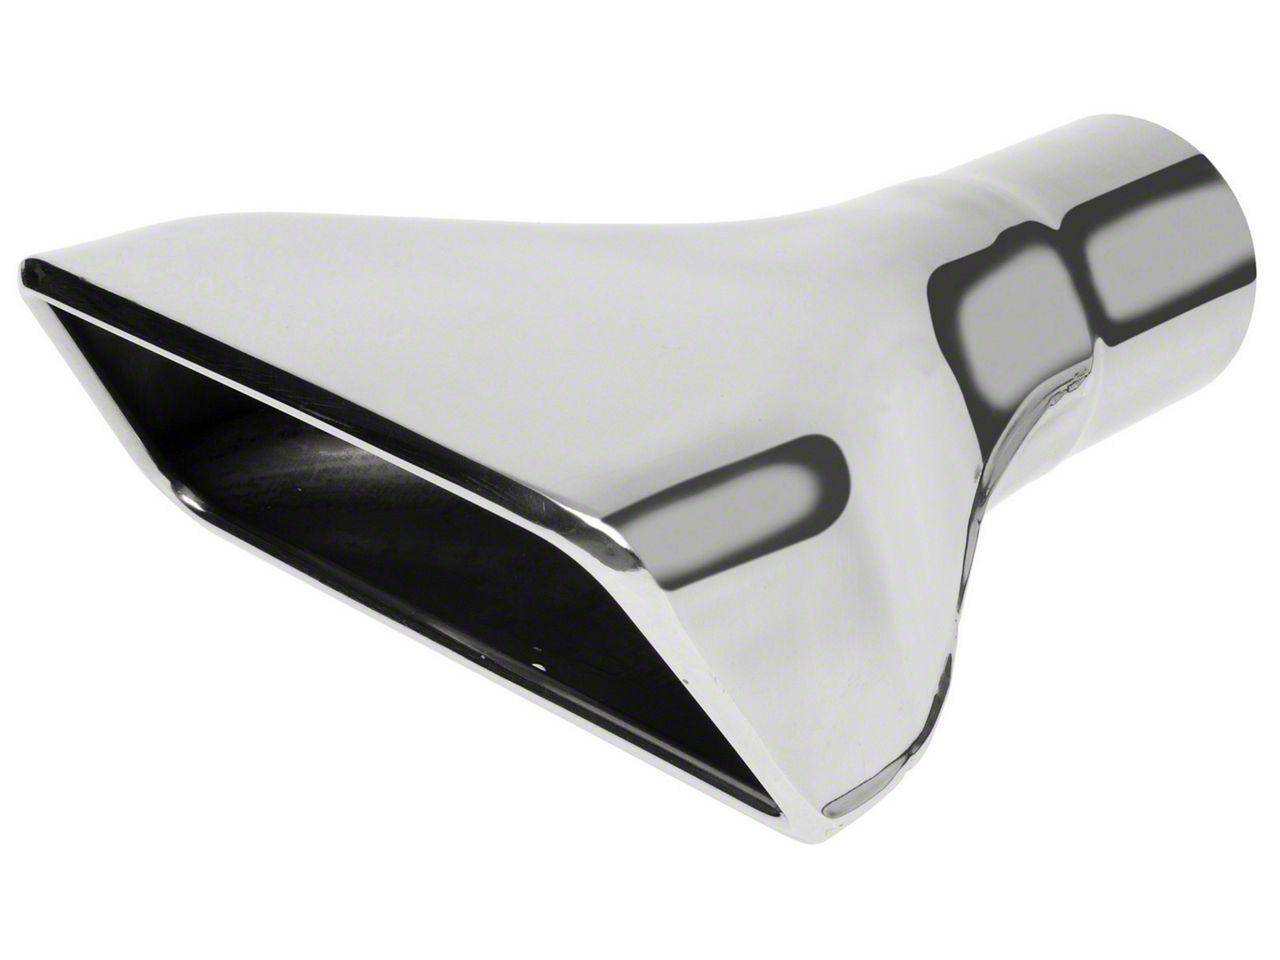 Roush Rectangular Exhaust Tip - Driver Side (05-09 GT)